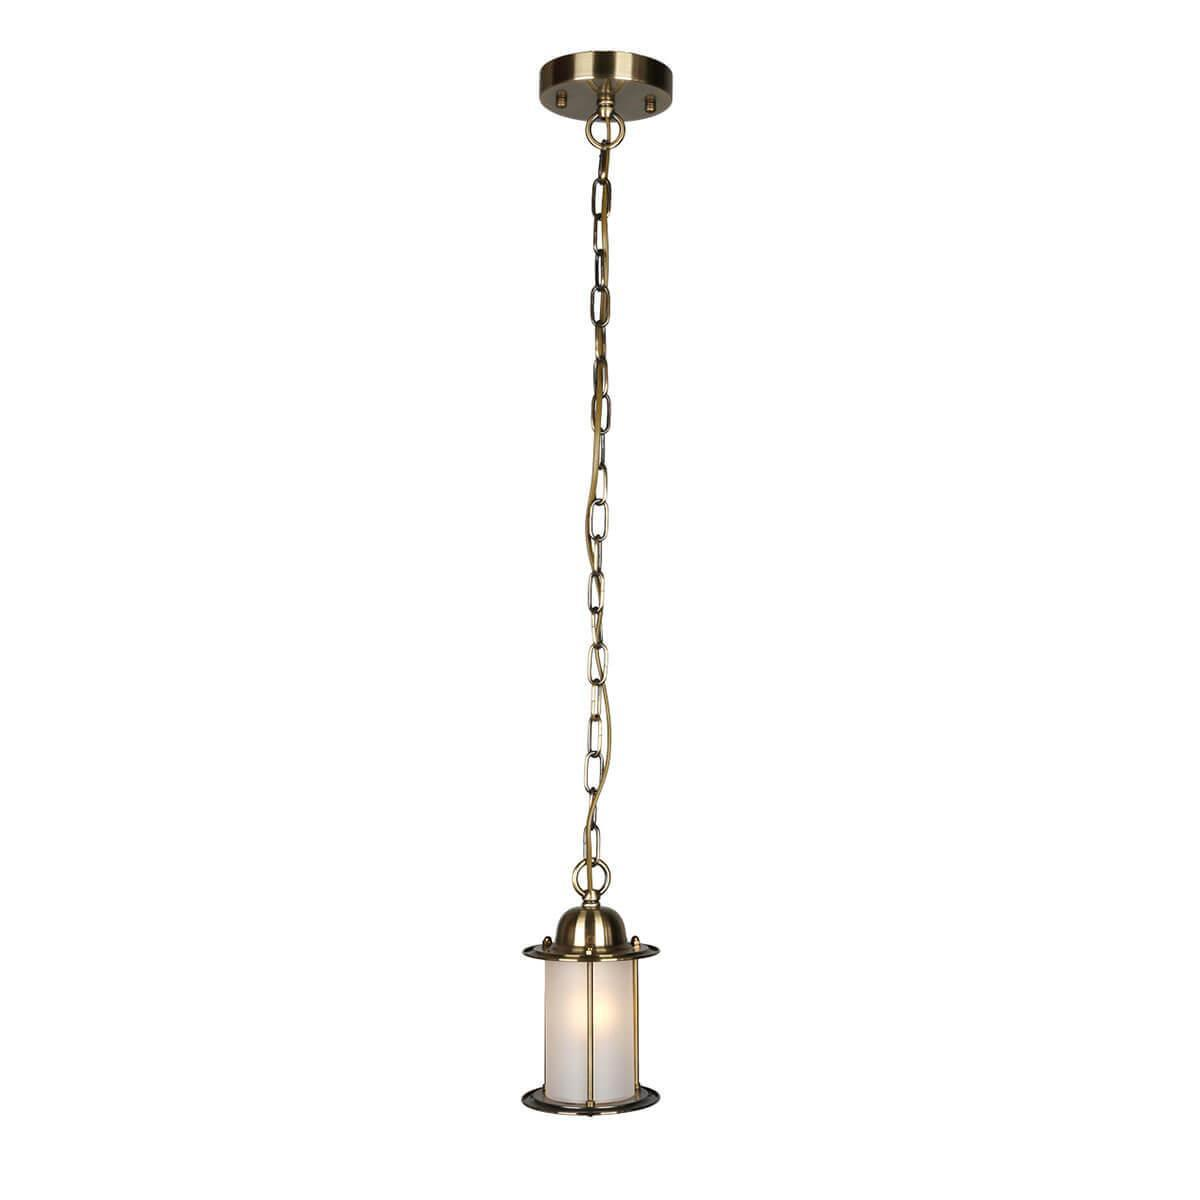 Фото - Подвесной светильник Omnilux OML-50306-01, E27, 60 Вт подвесной светильник omnilux oml 50306 01